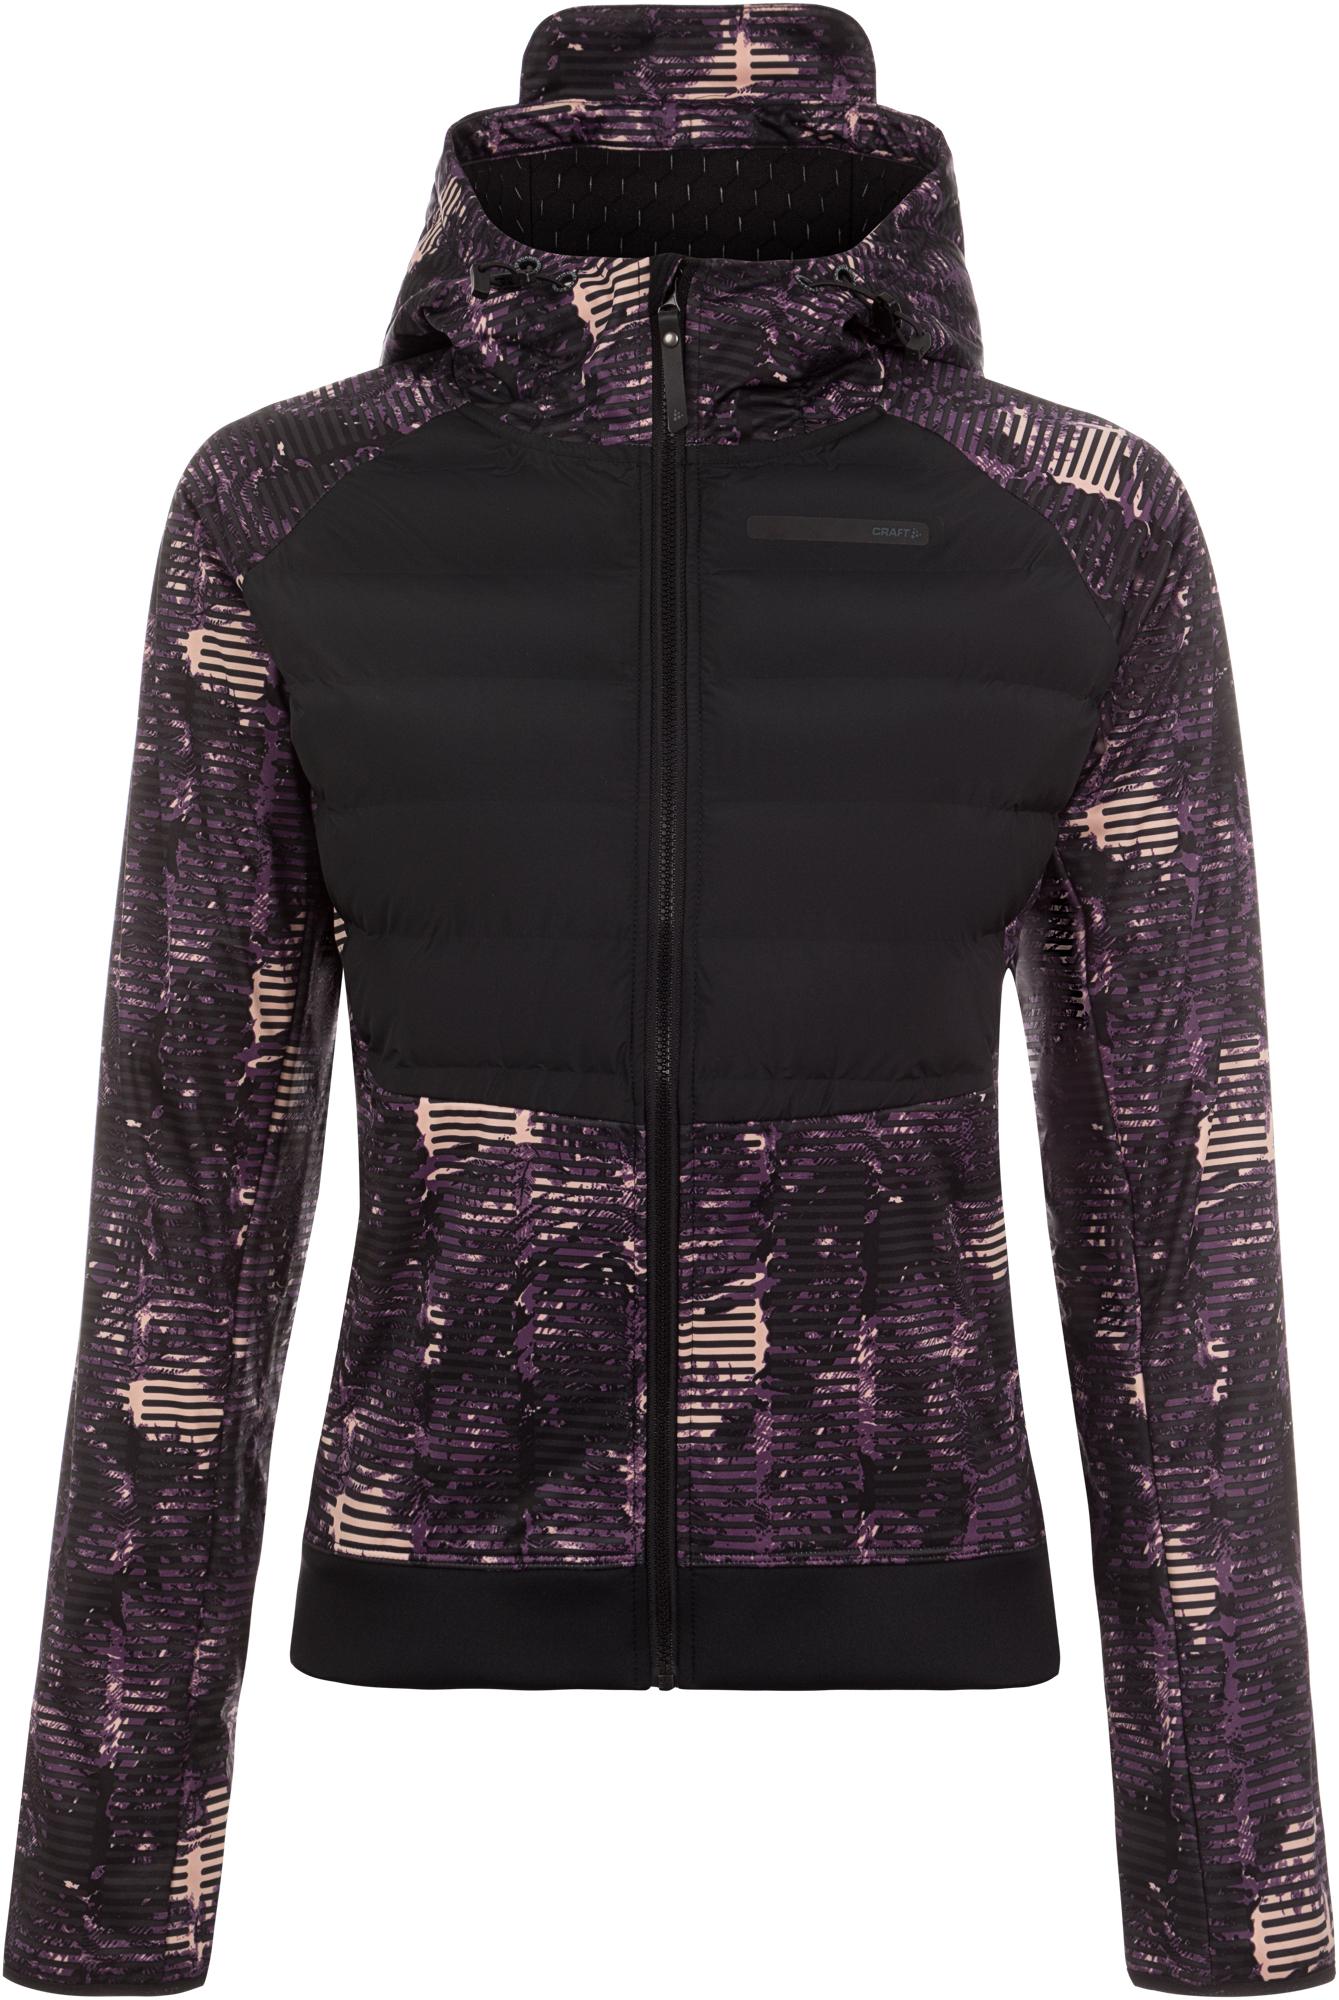 Craft Куртка женская Pursuit Thermal, размер 48-50